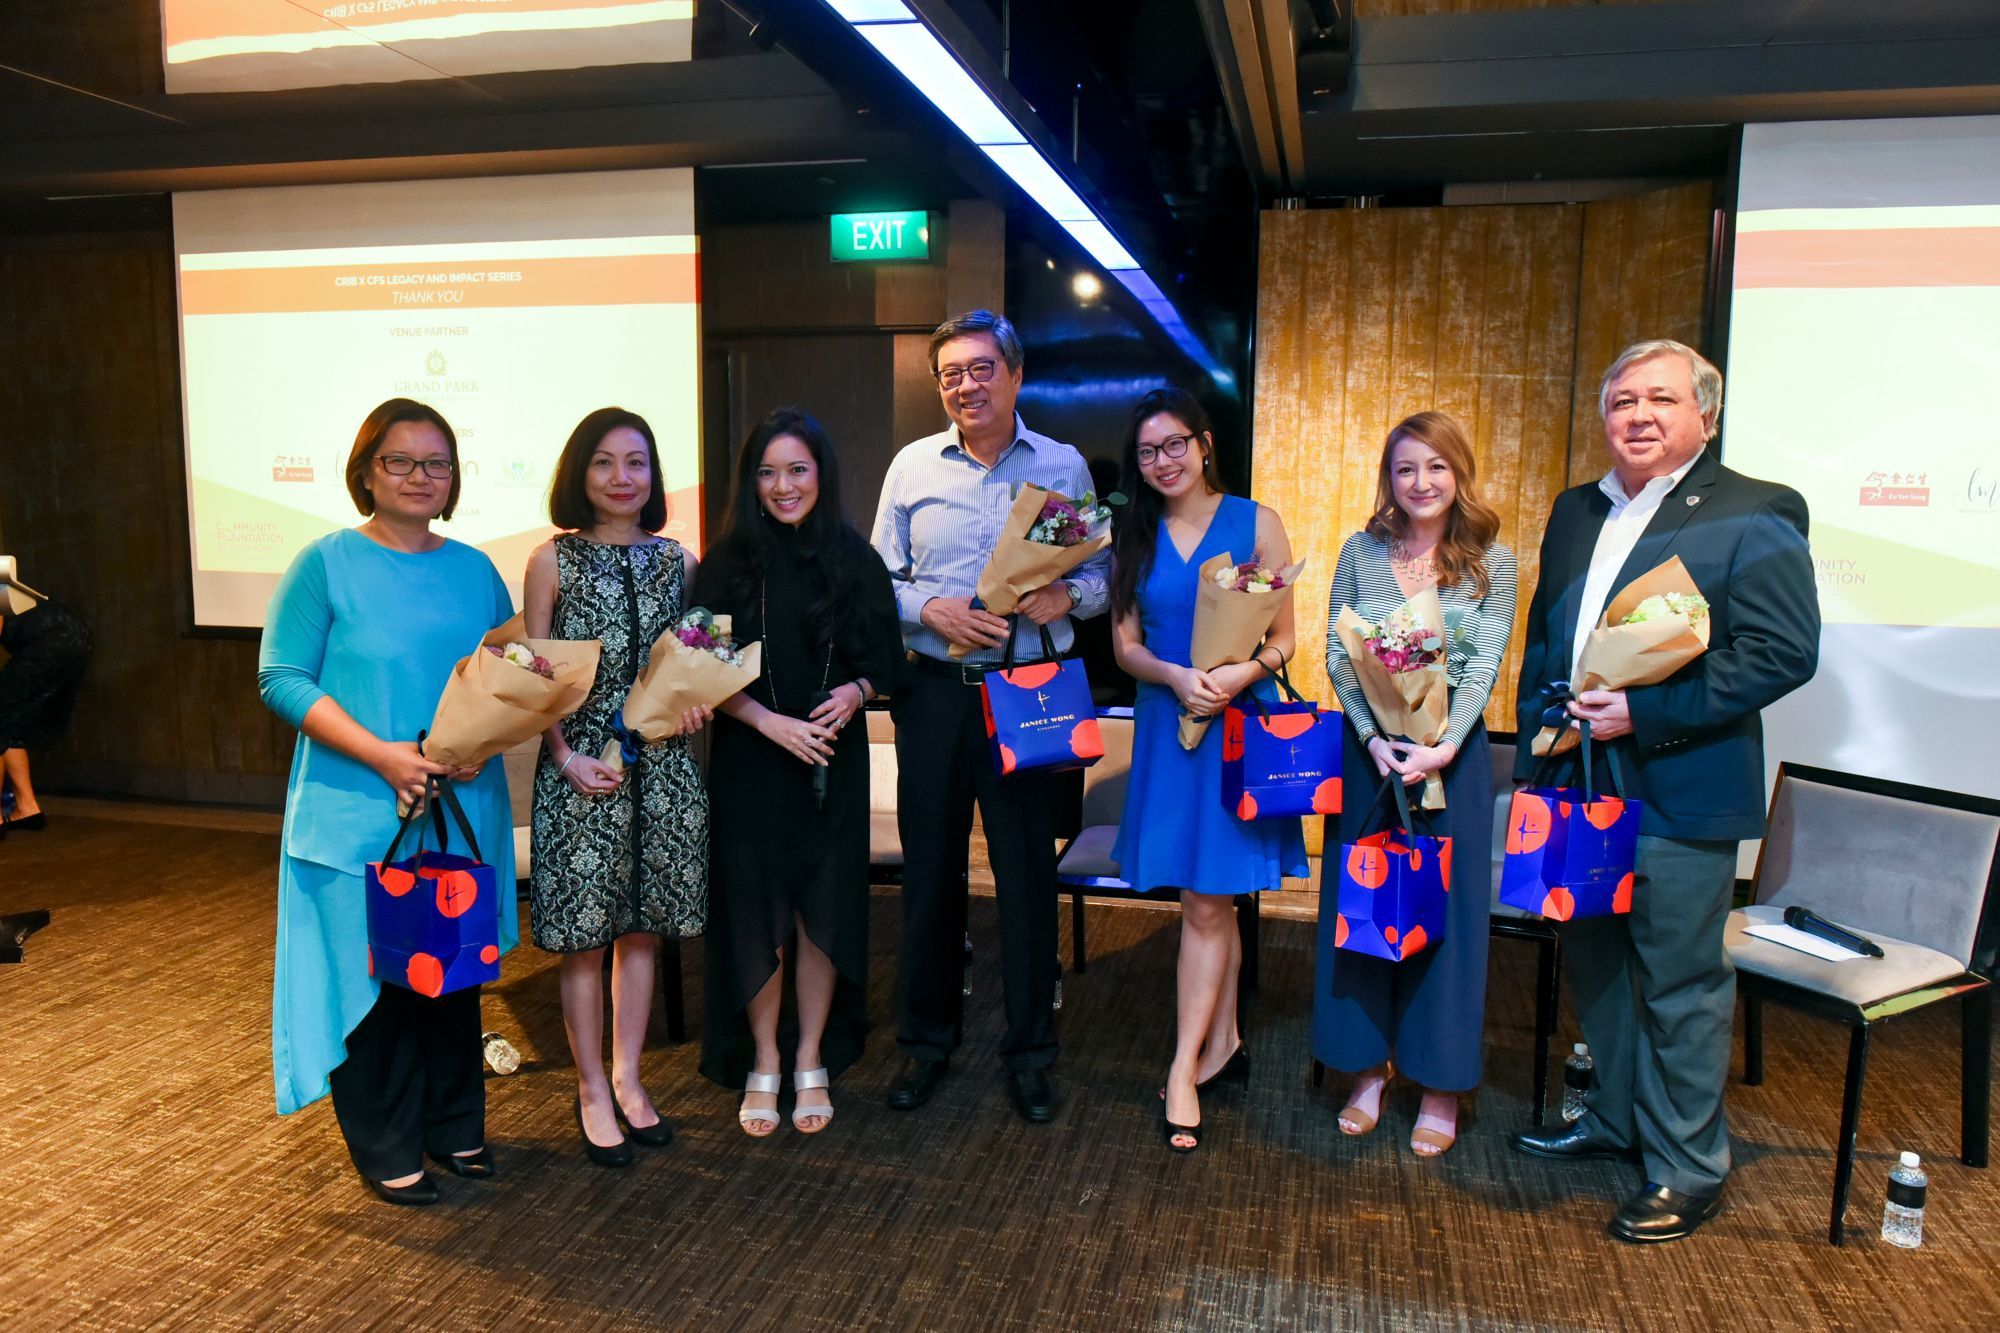 Patsian Low, Catherine Loh, Elaine Kim, Richard Eu, Rebecca Eu, Sharon Chua, Keith Chua